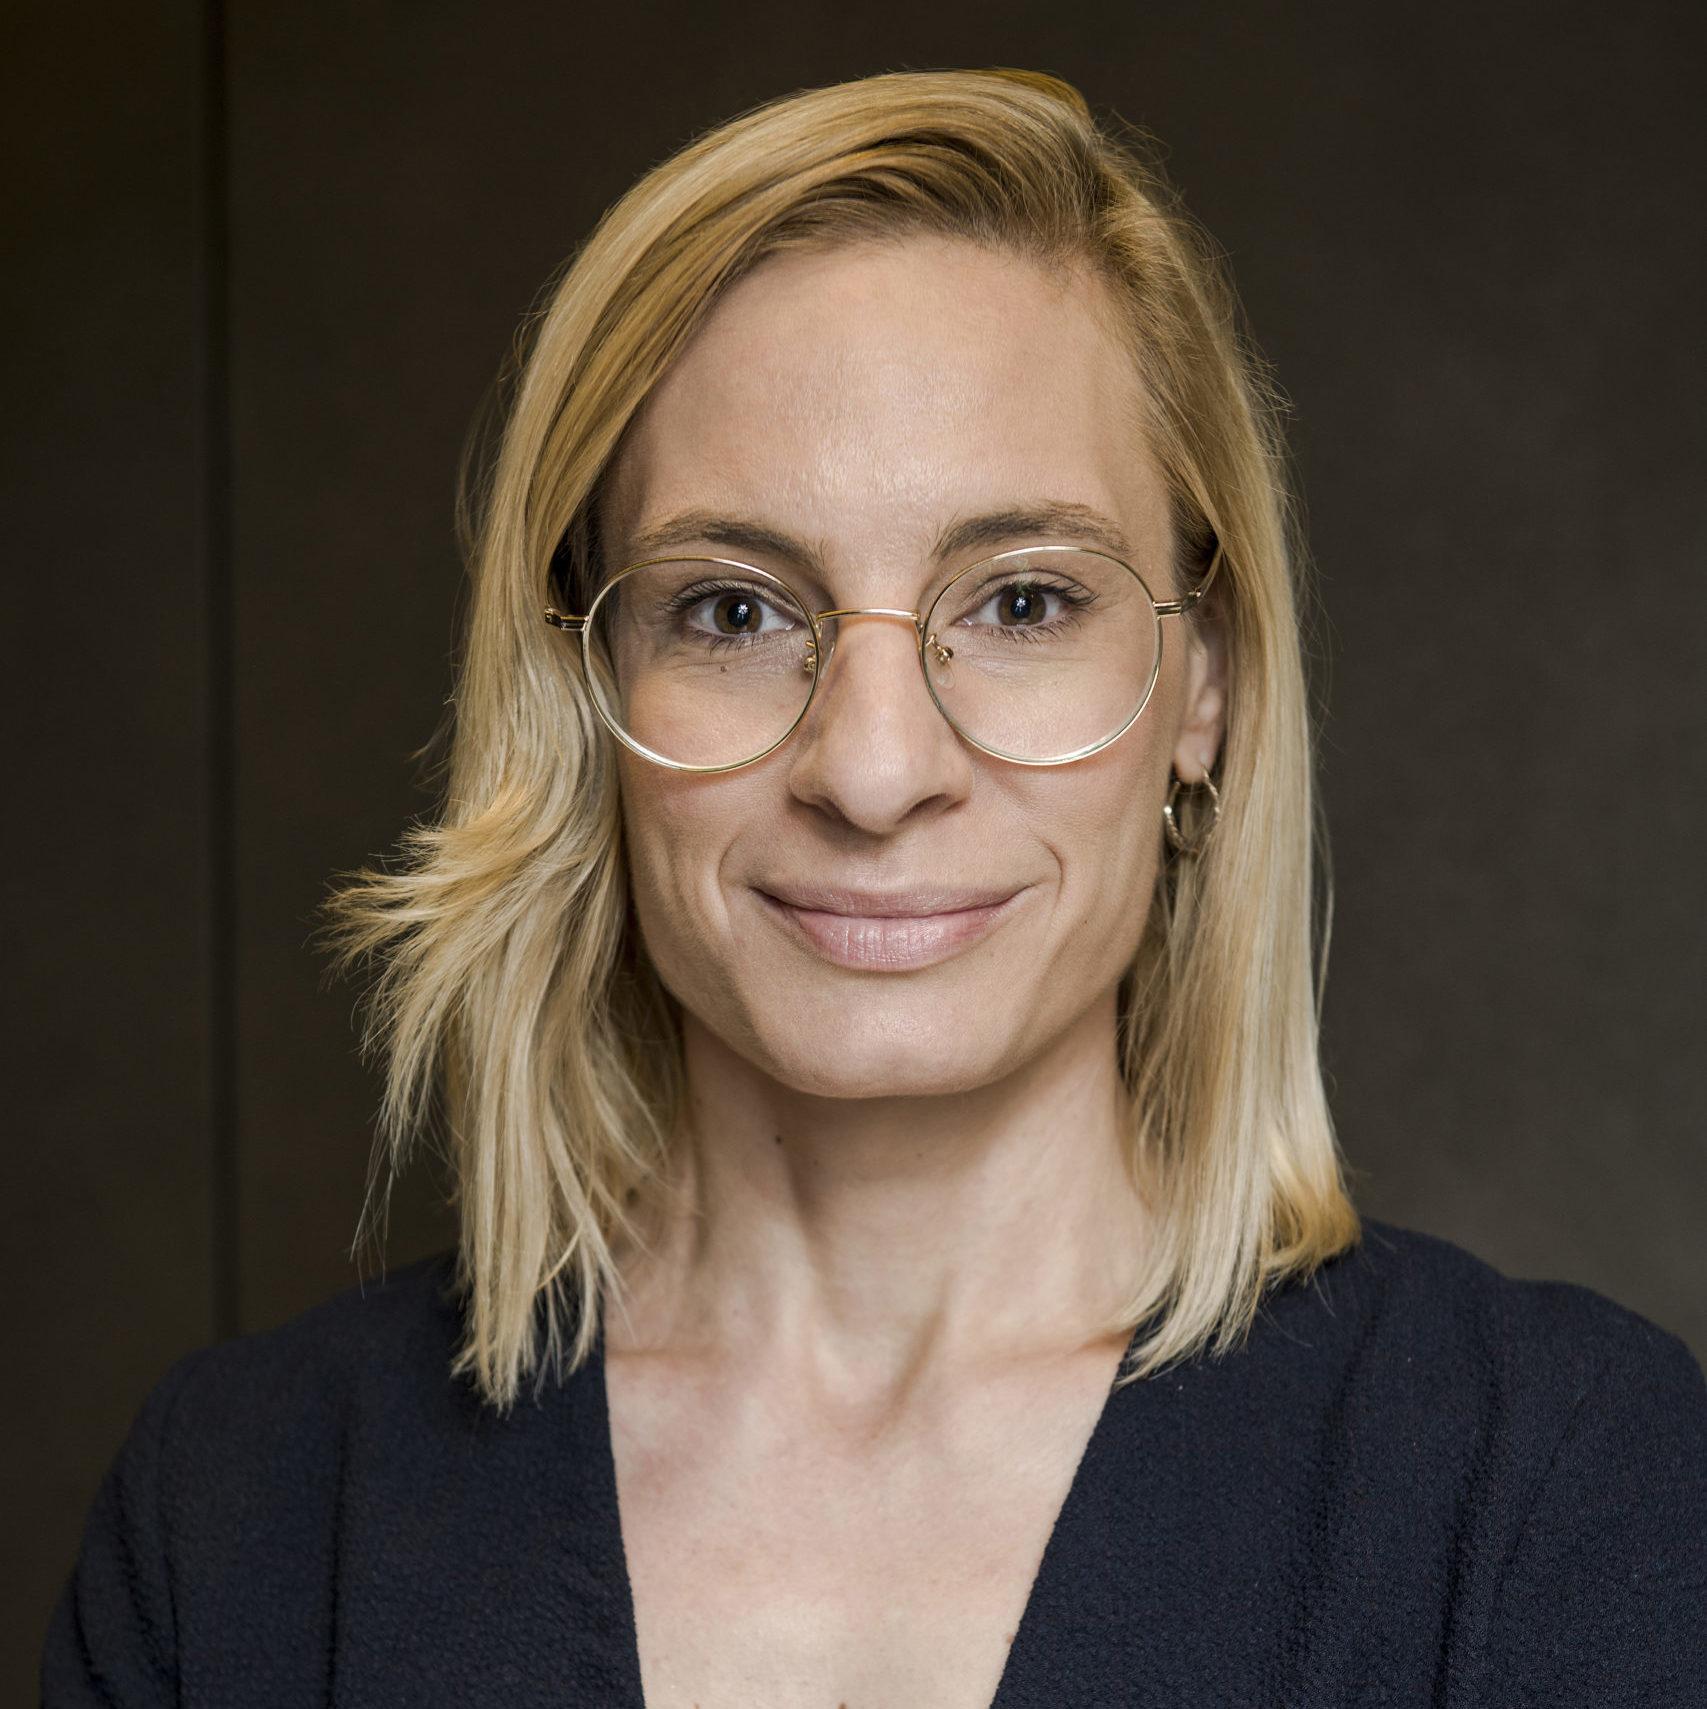 Agnes Lecznar-Wons